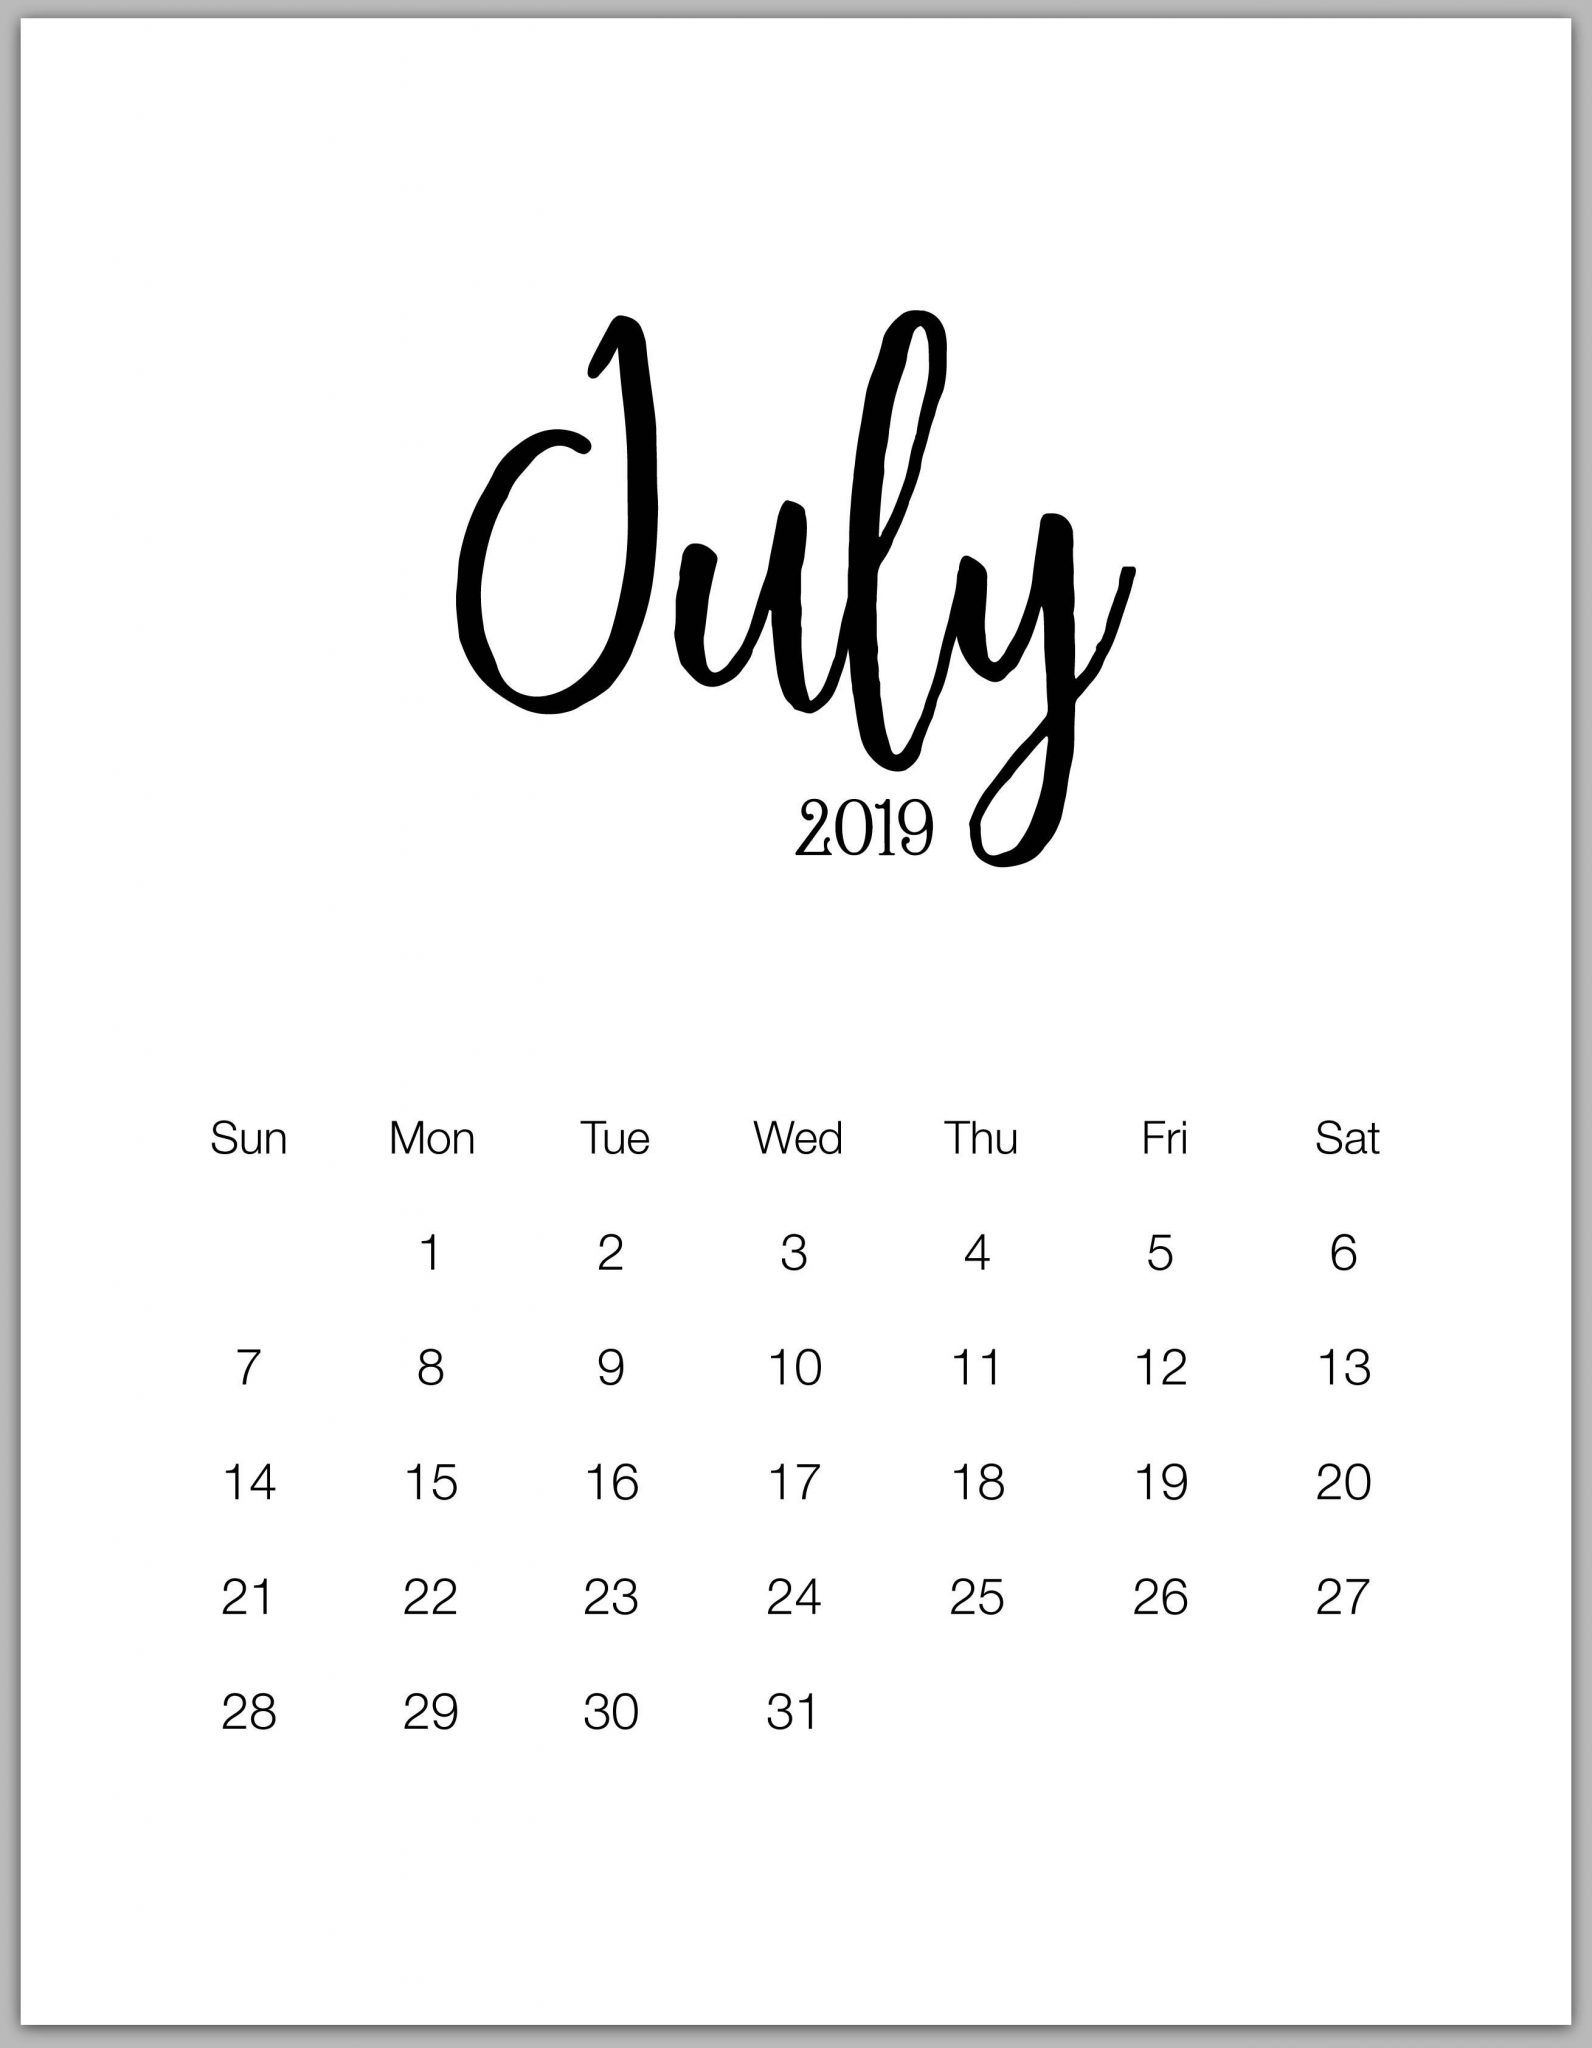 Modern Minimal July 2019 Calendar Blank | 100+ July 2019 Calendar for Free Printable Blank Advent Activities List Minimal